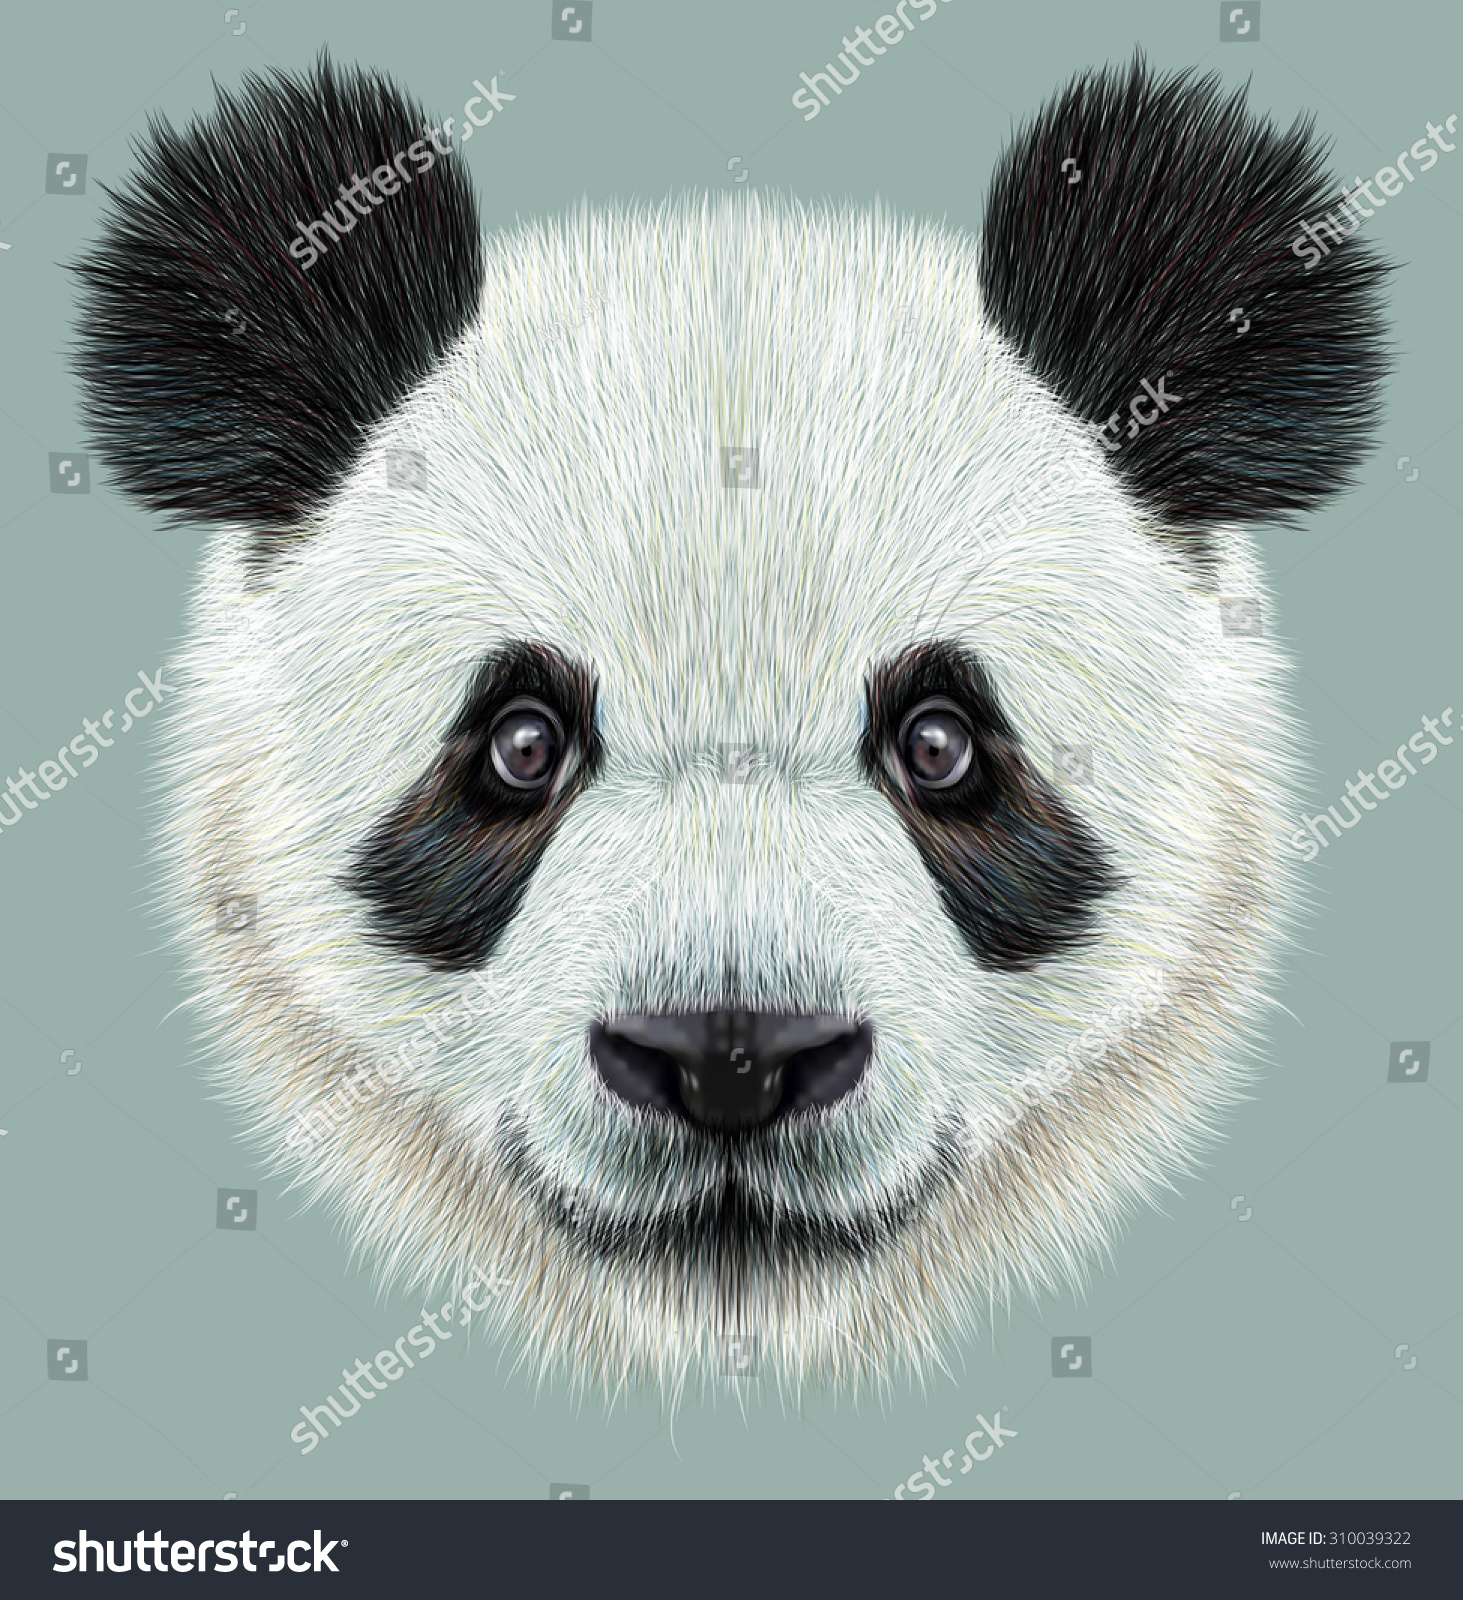 Illustrative portrait of Panda.Cute attractive face bears